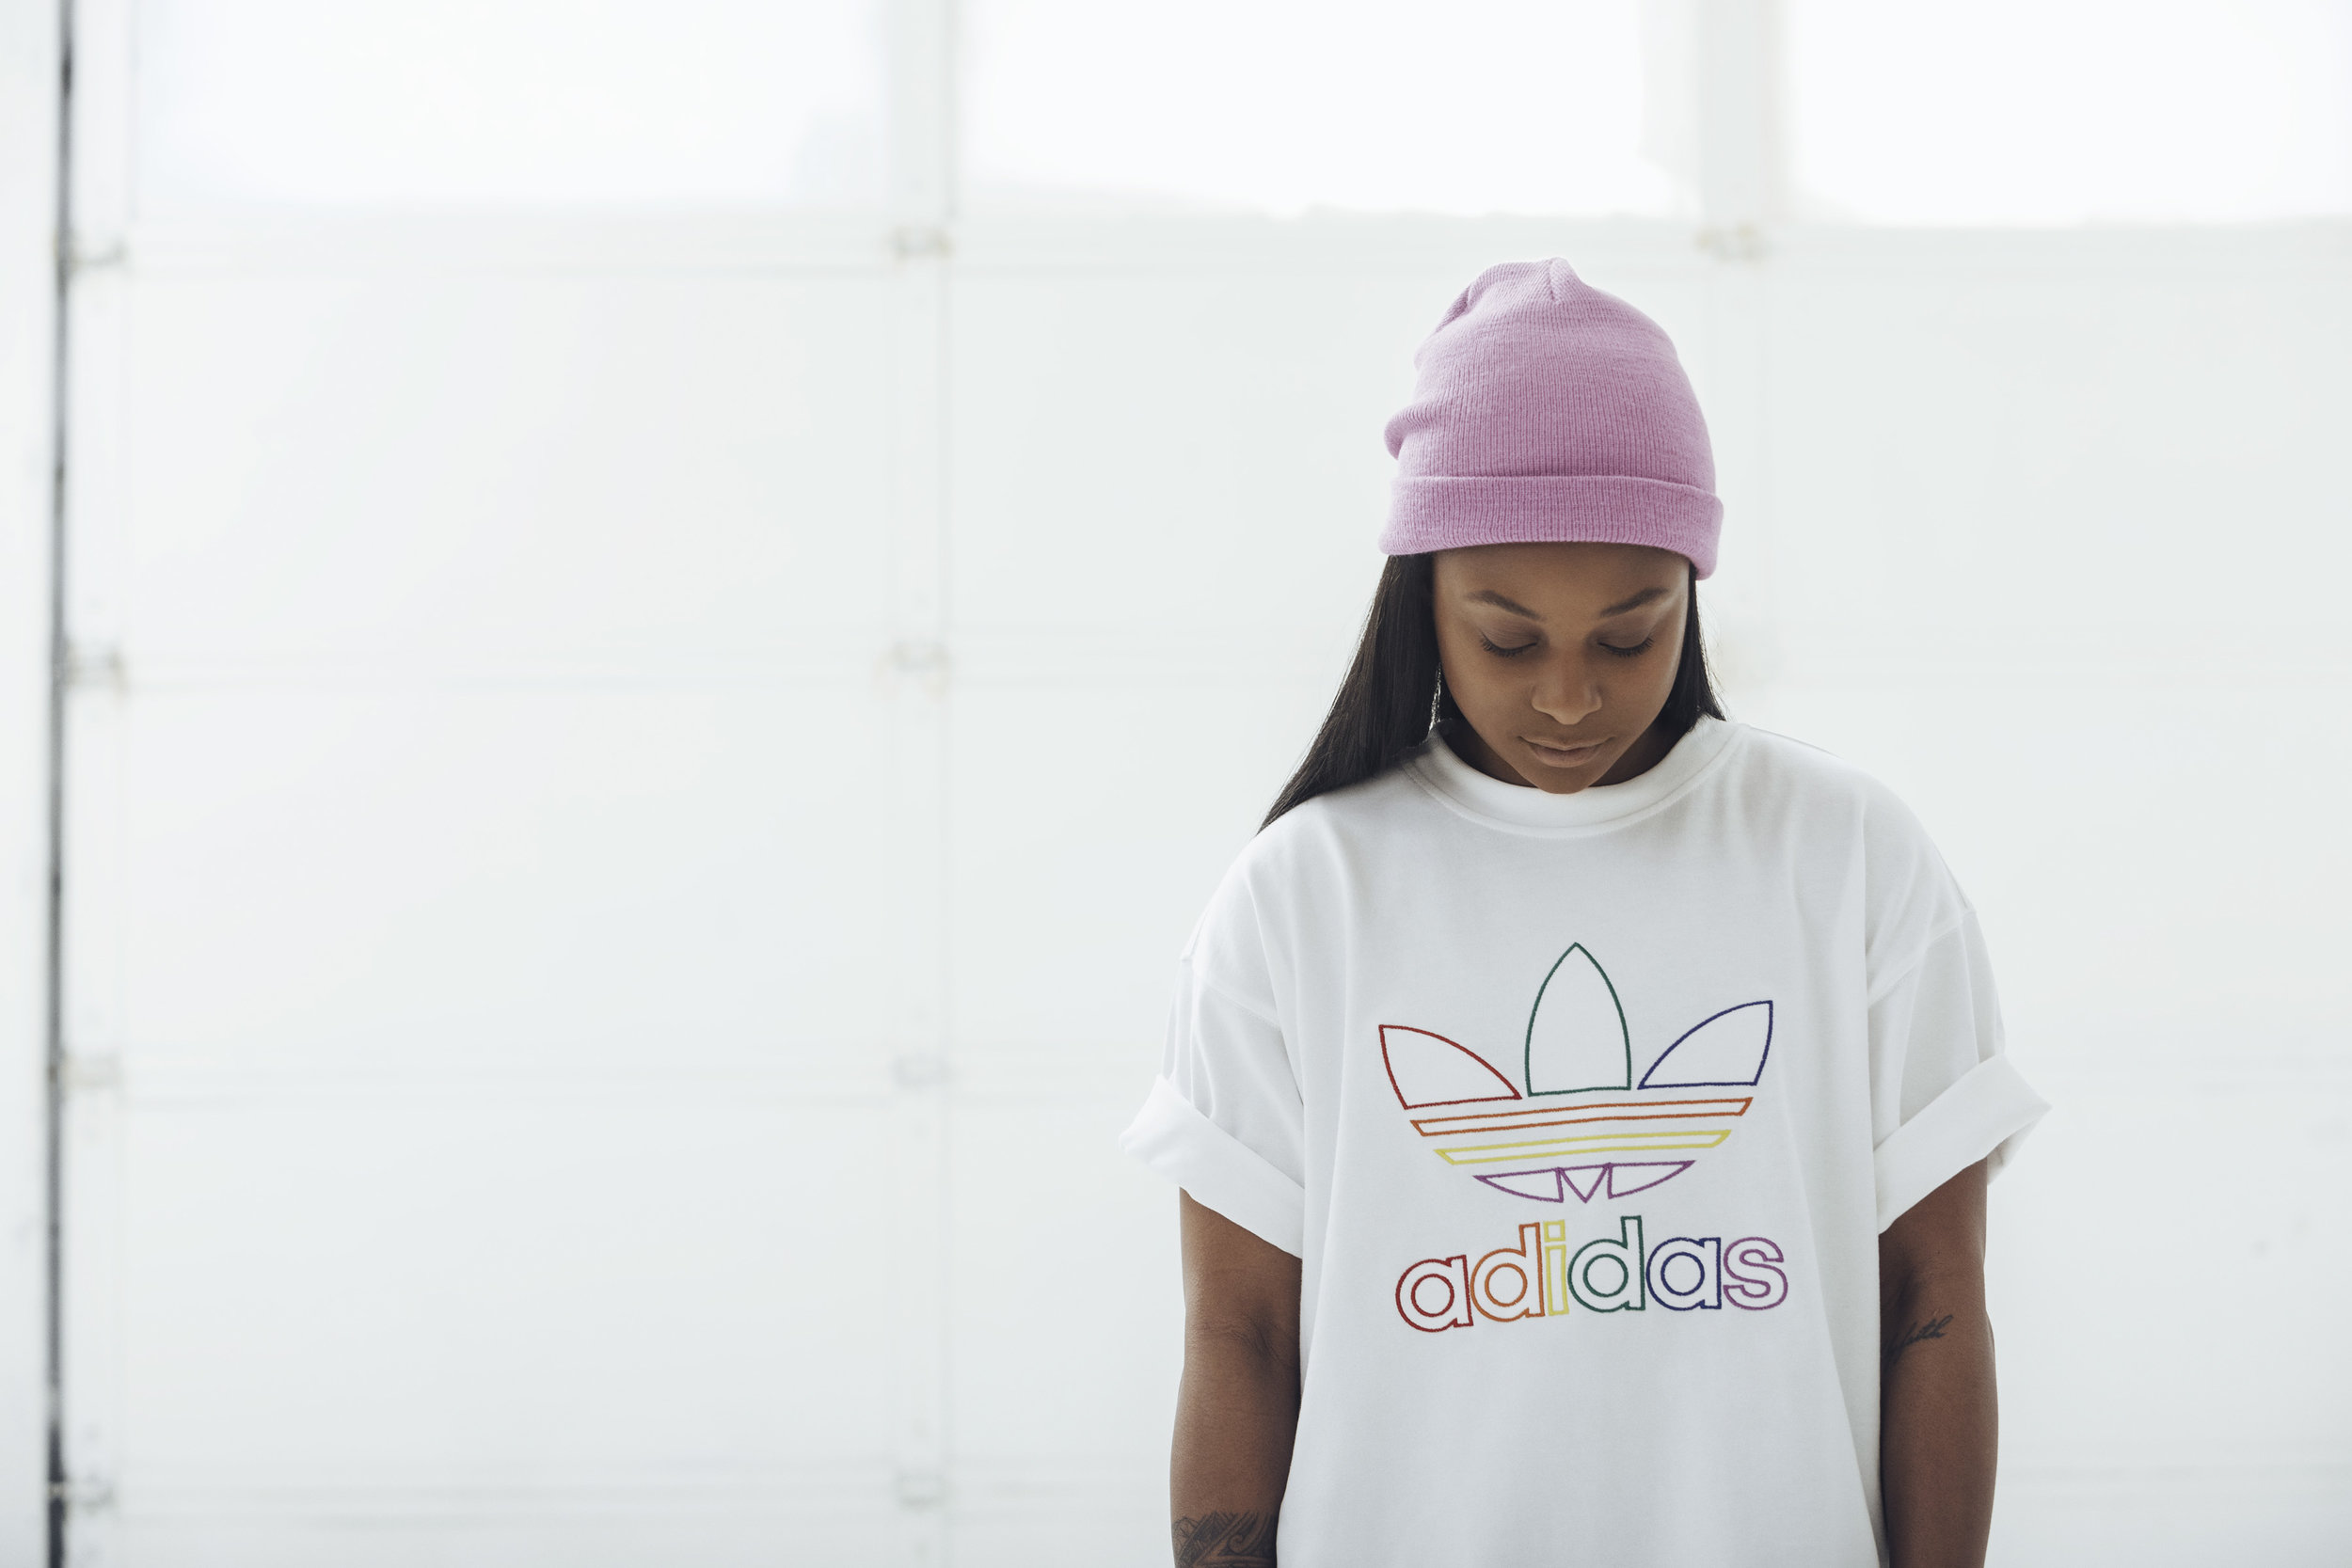 adidas_pride_love_unites_by_gia_goodrich_lesbian_artist_activist_Shot_01_Taylor_Lk_01B_00331.jpg